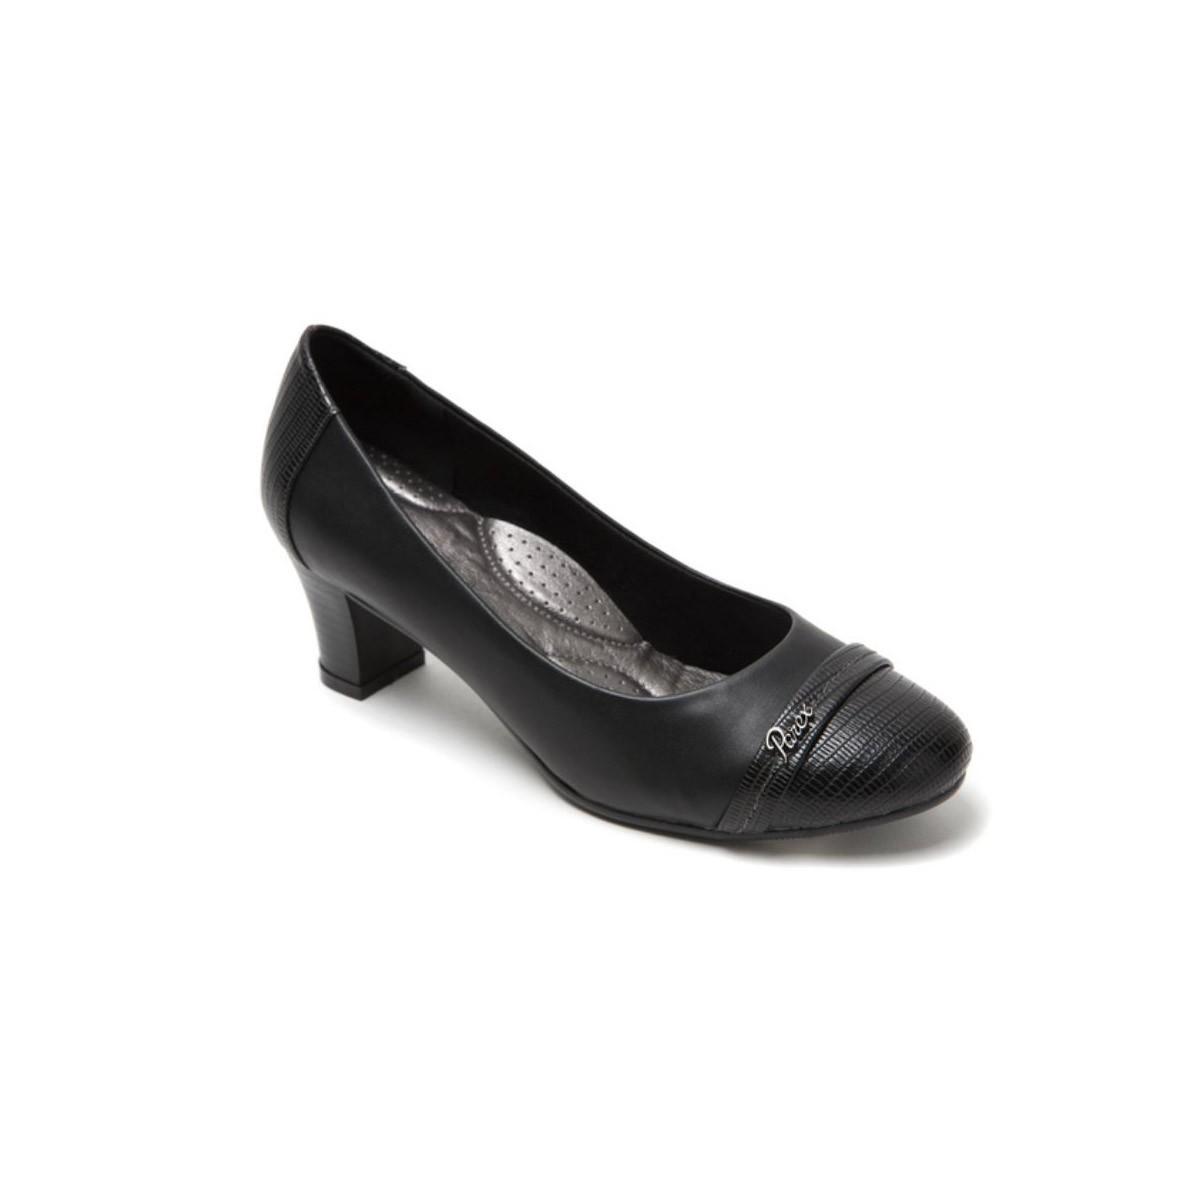 Parex Γυναικεία Παπούτσια Γόβες IG16994 Μαύρο Parex IG16994 Μαύρο